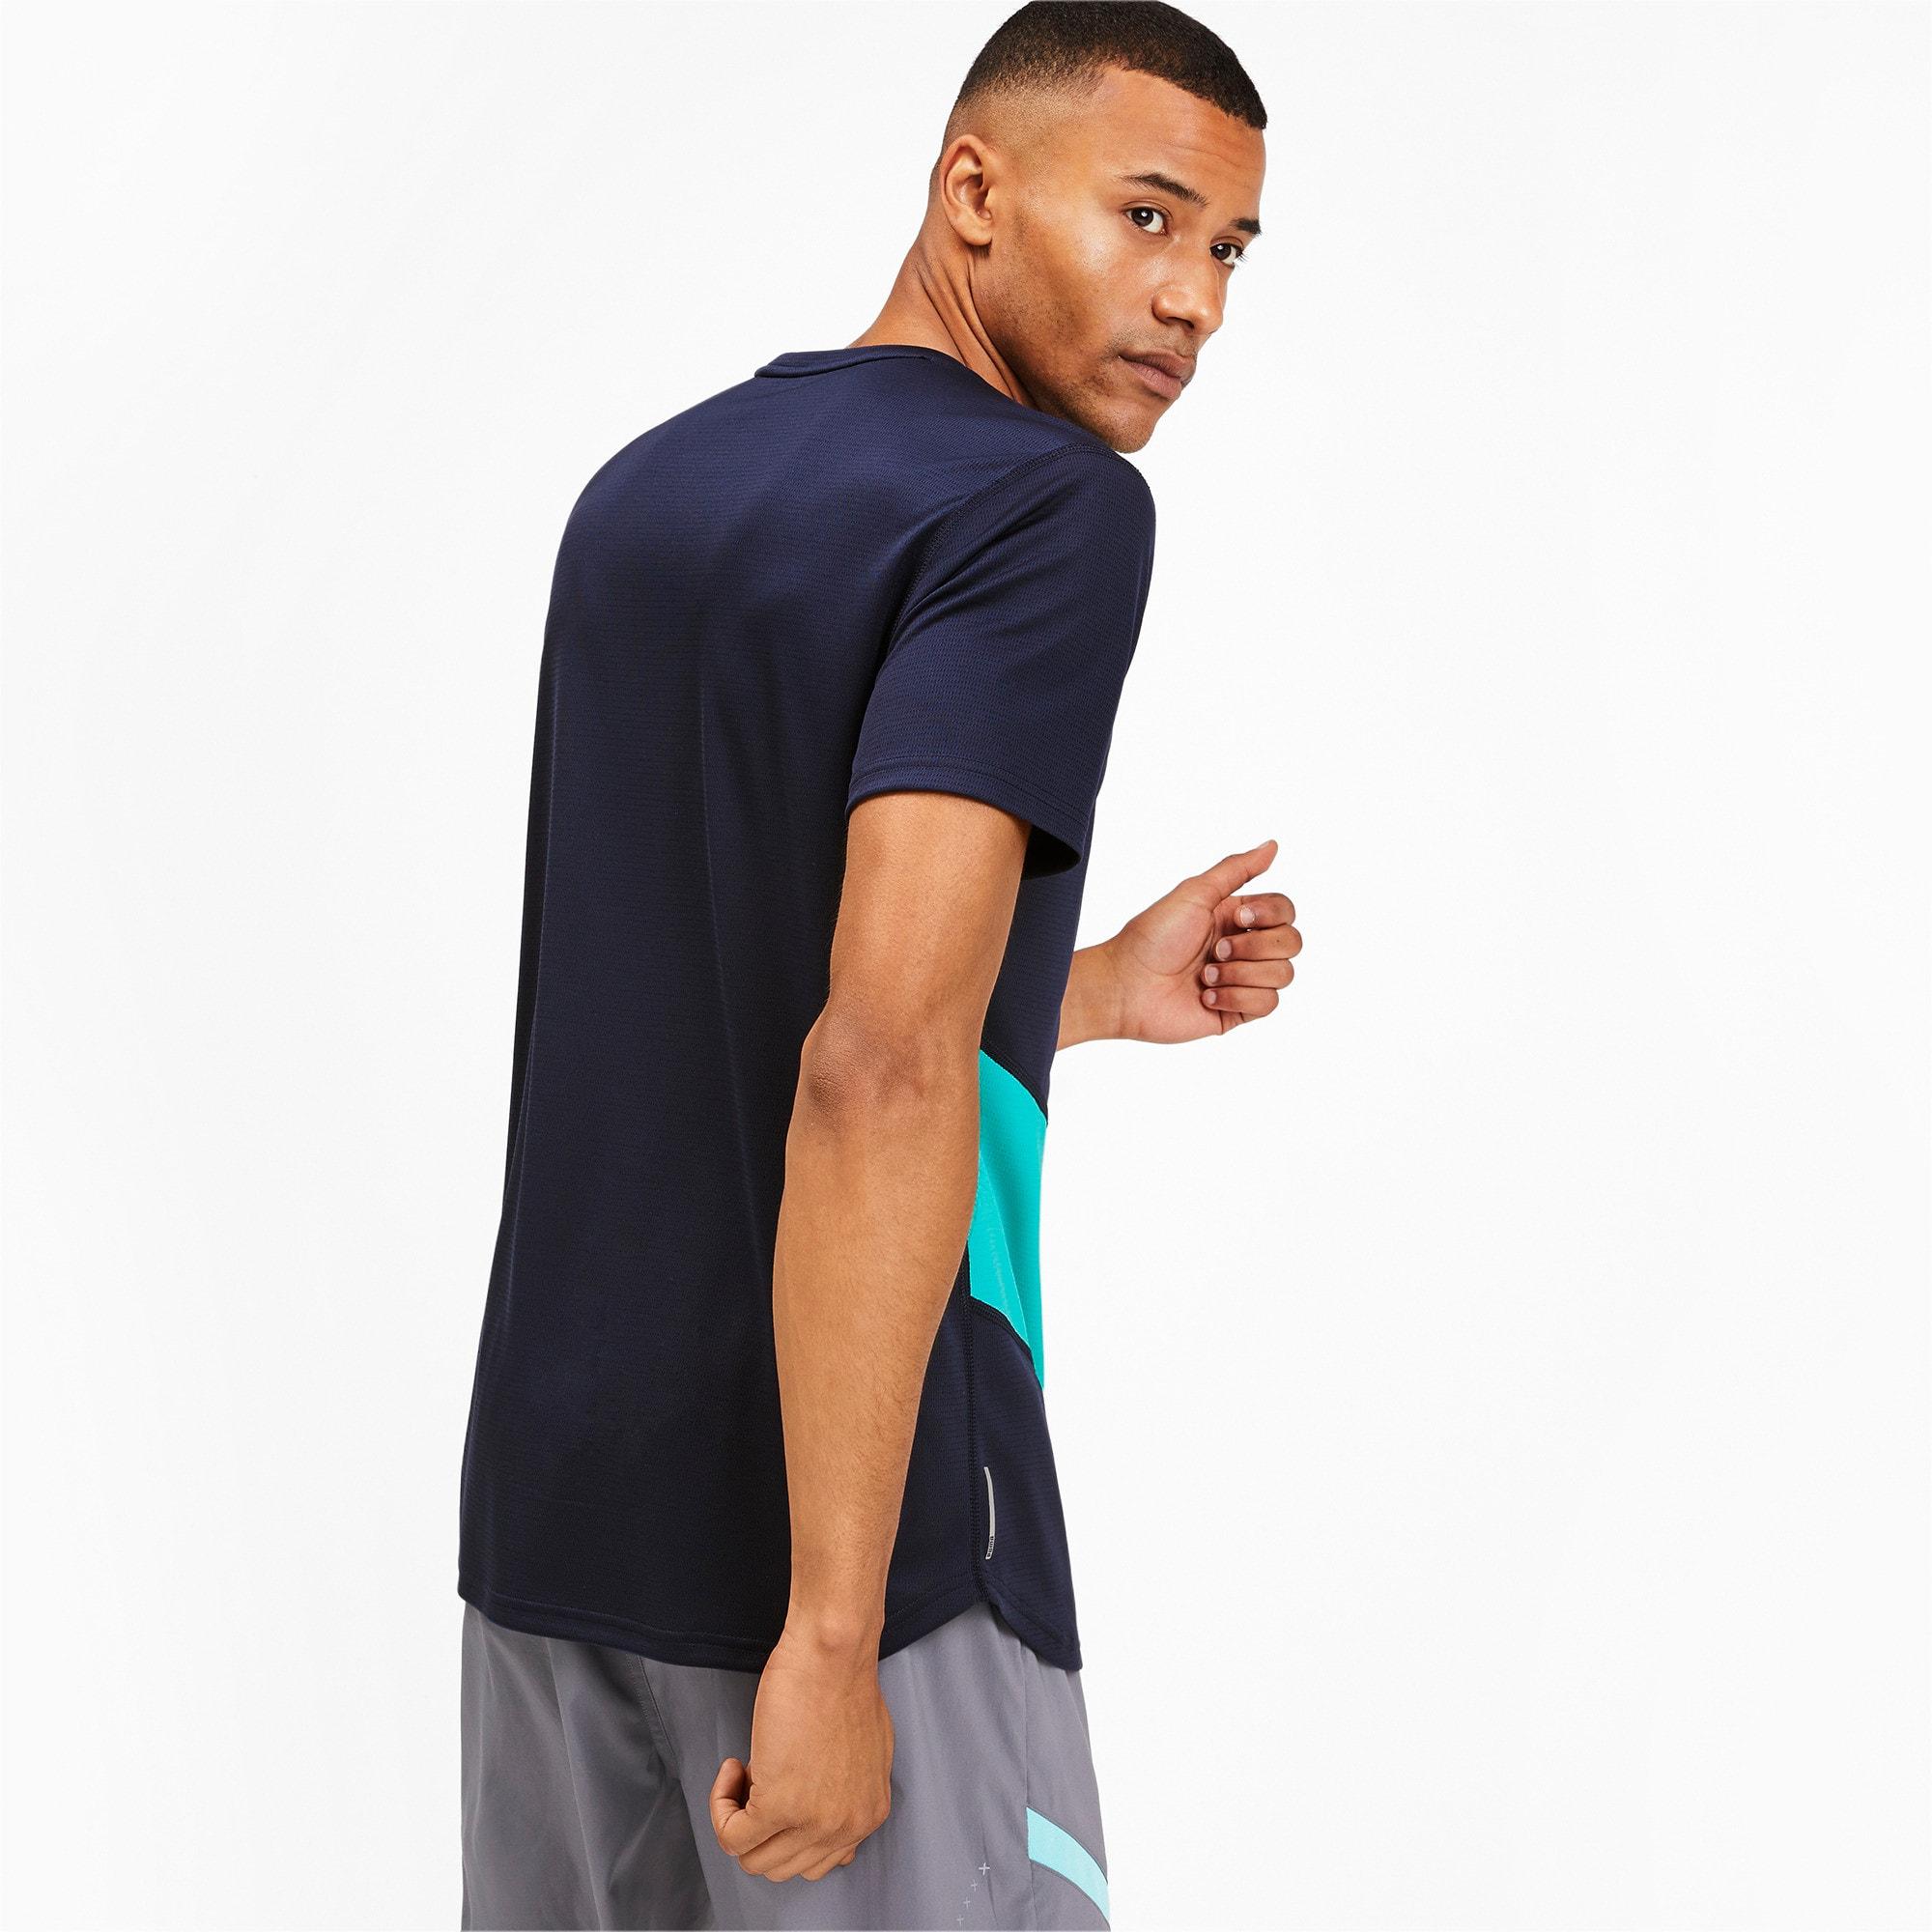 Thumbnail 2 van IGNITE hardloopshirt voor mannen, Peacoat-blauwturquoise, medium